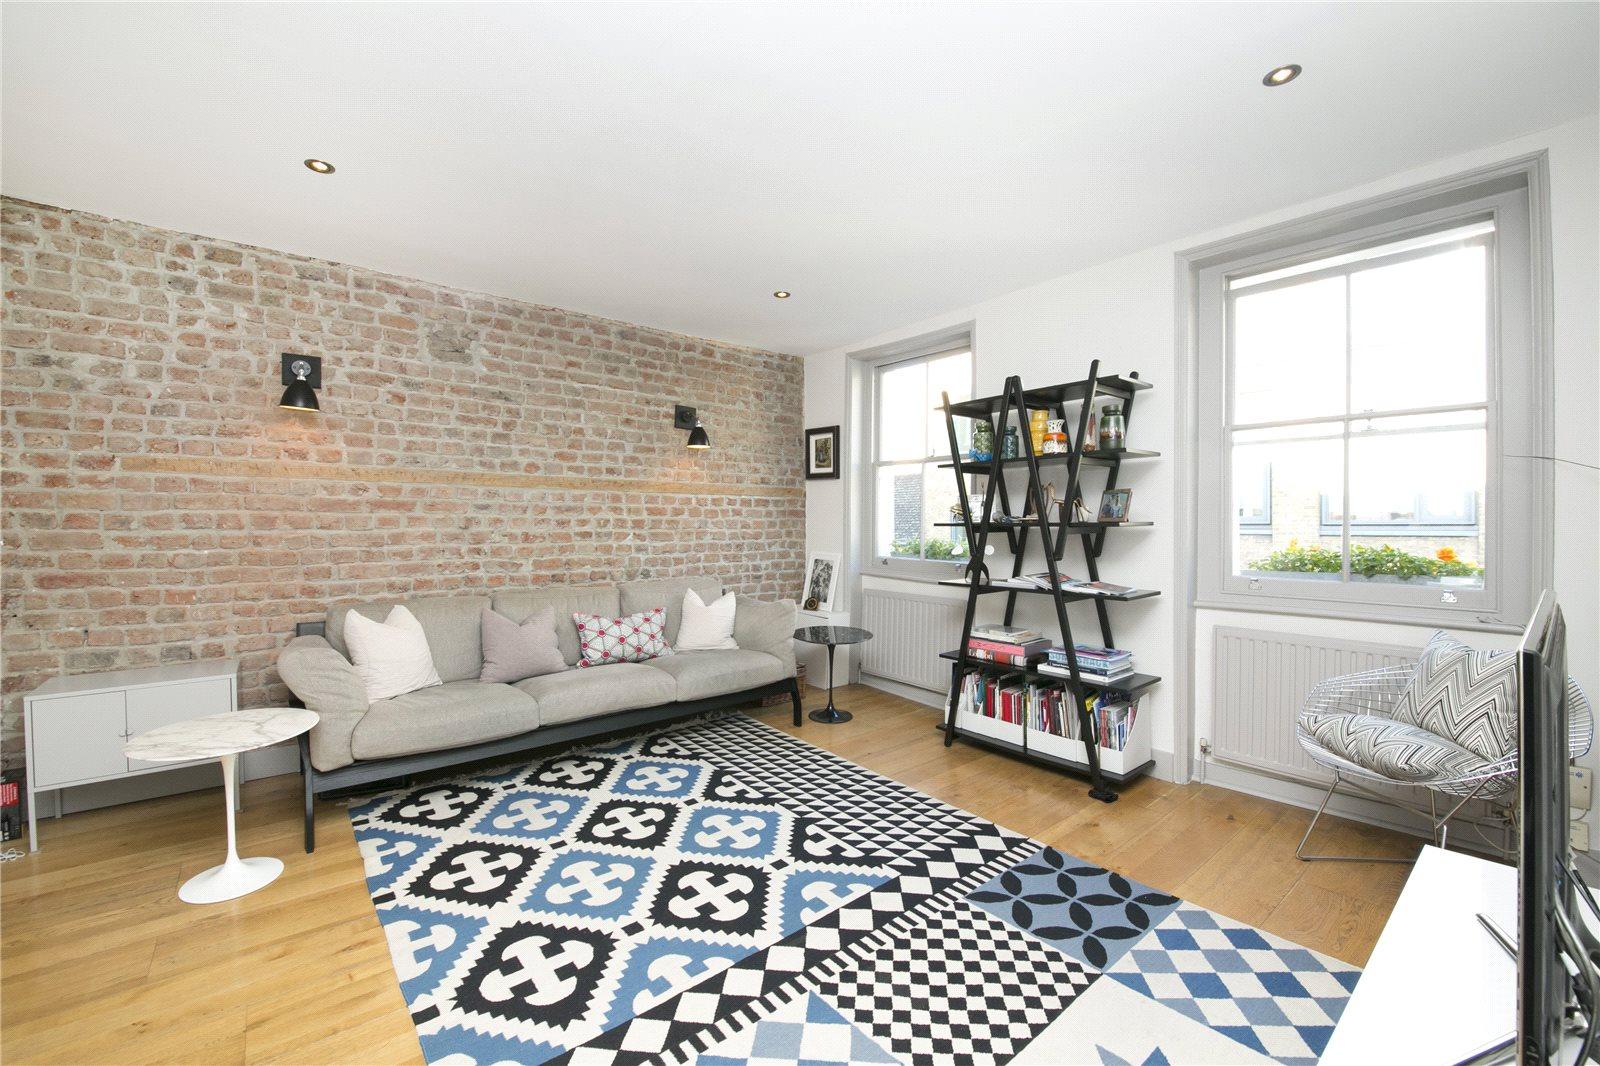 2 Bedrooms Flat for sale in Bowling Green Lane, Clerkenwell, EC1R